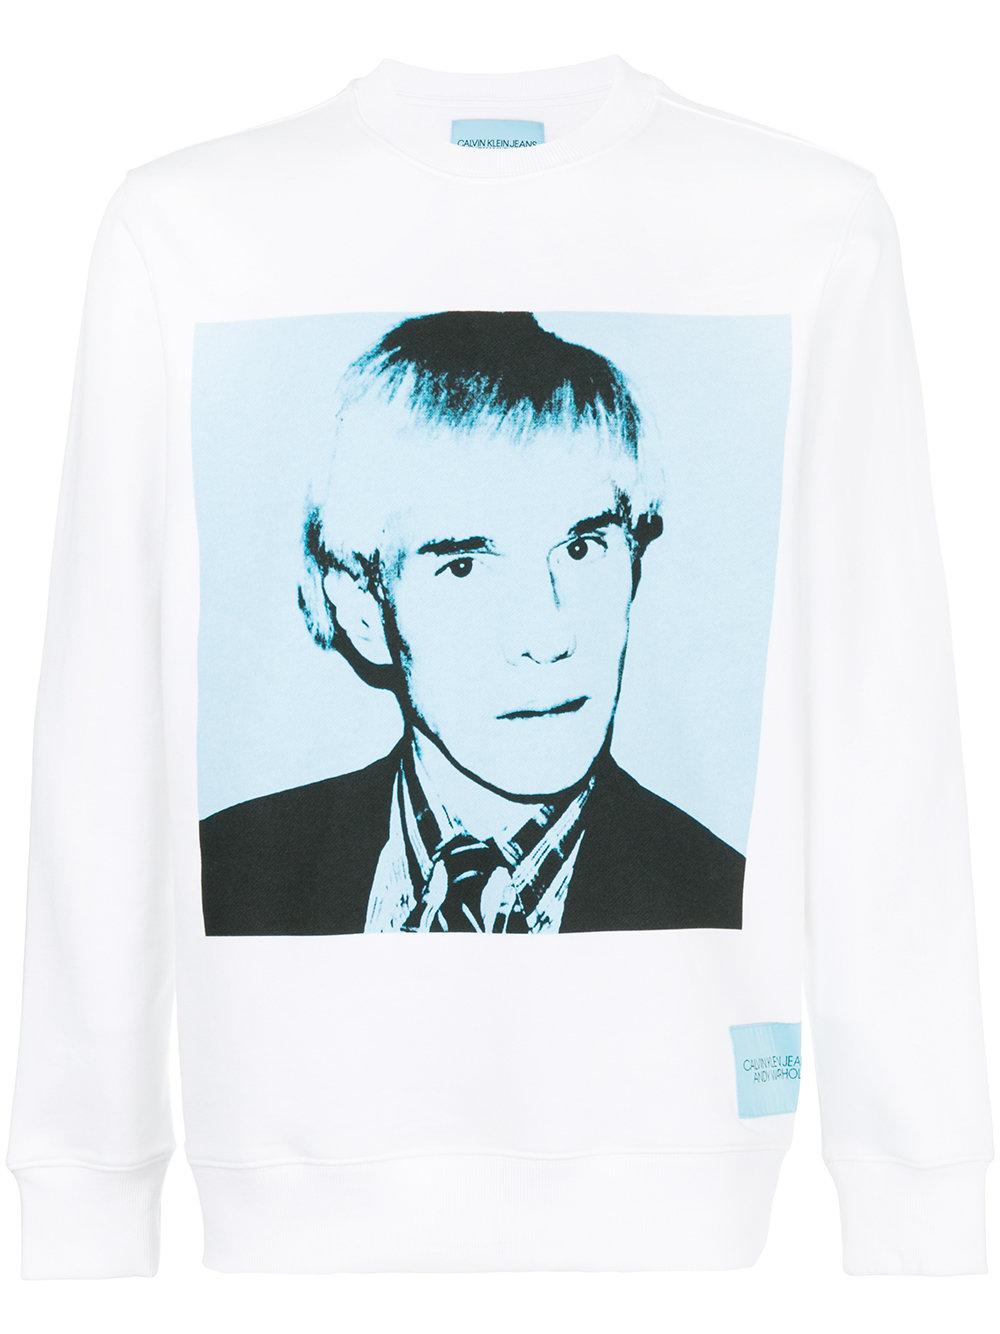 CALVIN KLEIN JEANS Andy Warhol print sweatshirt